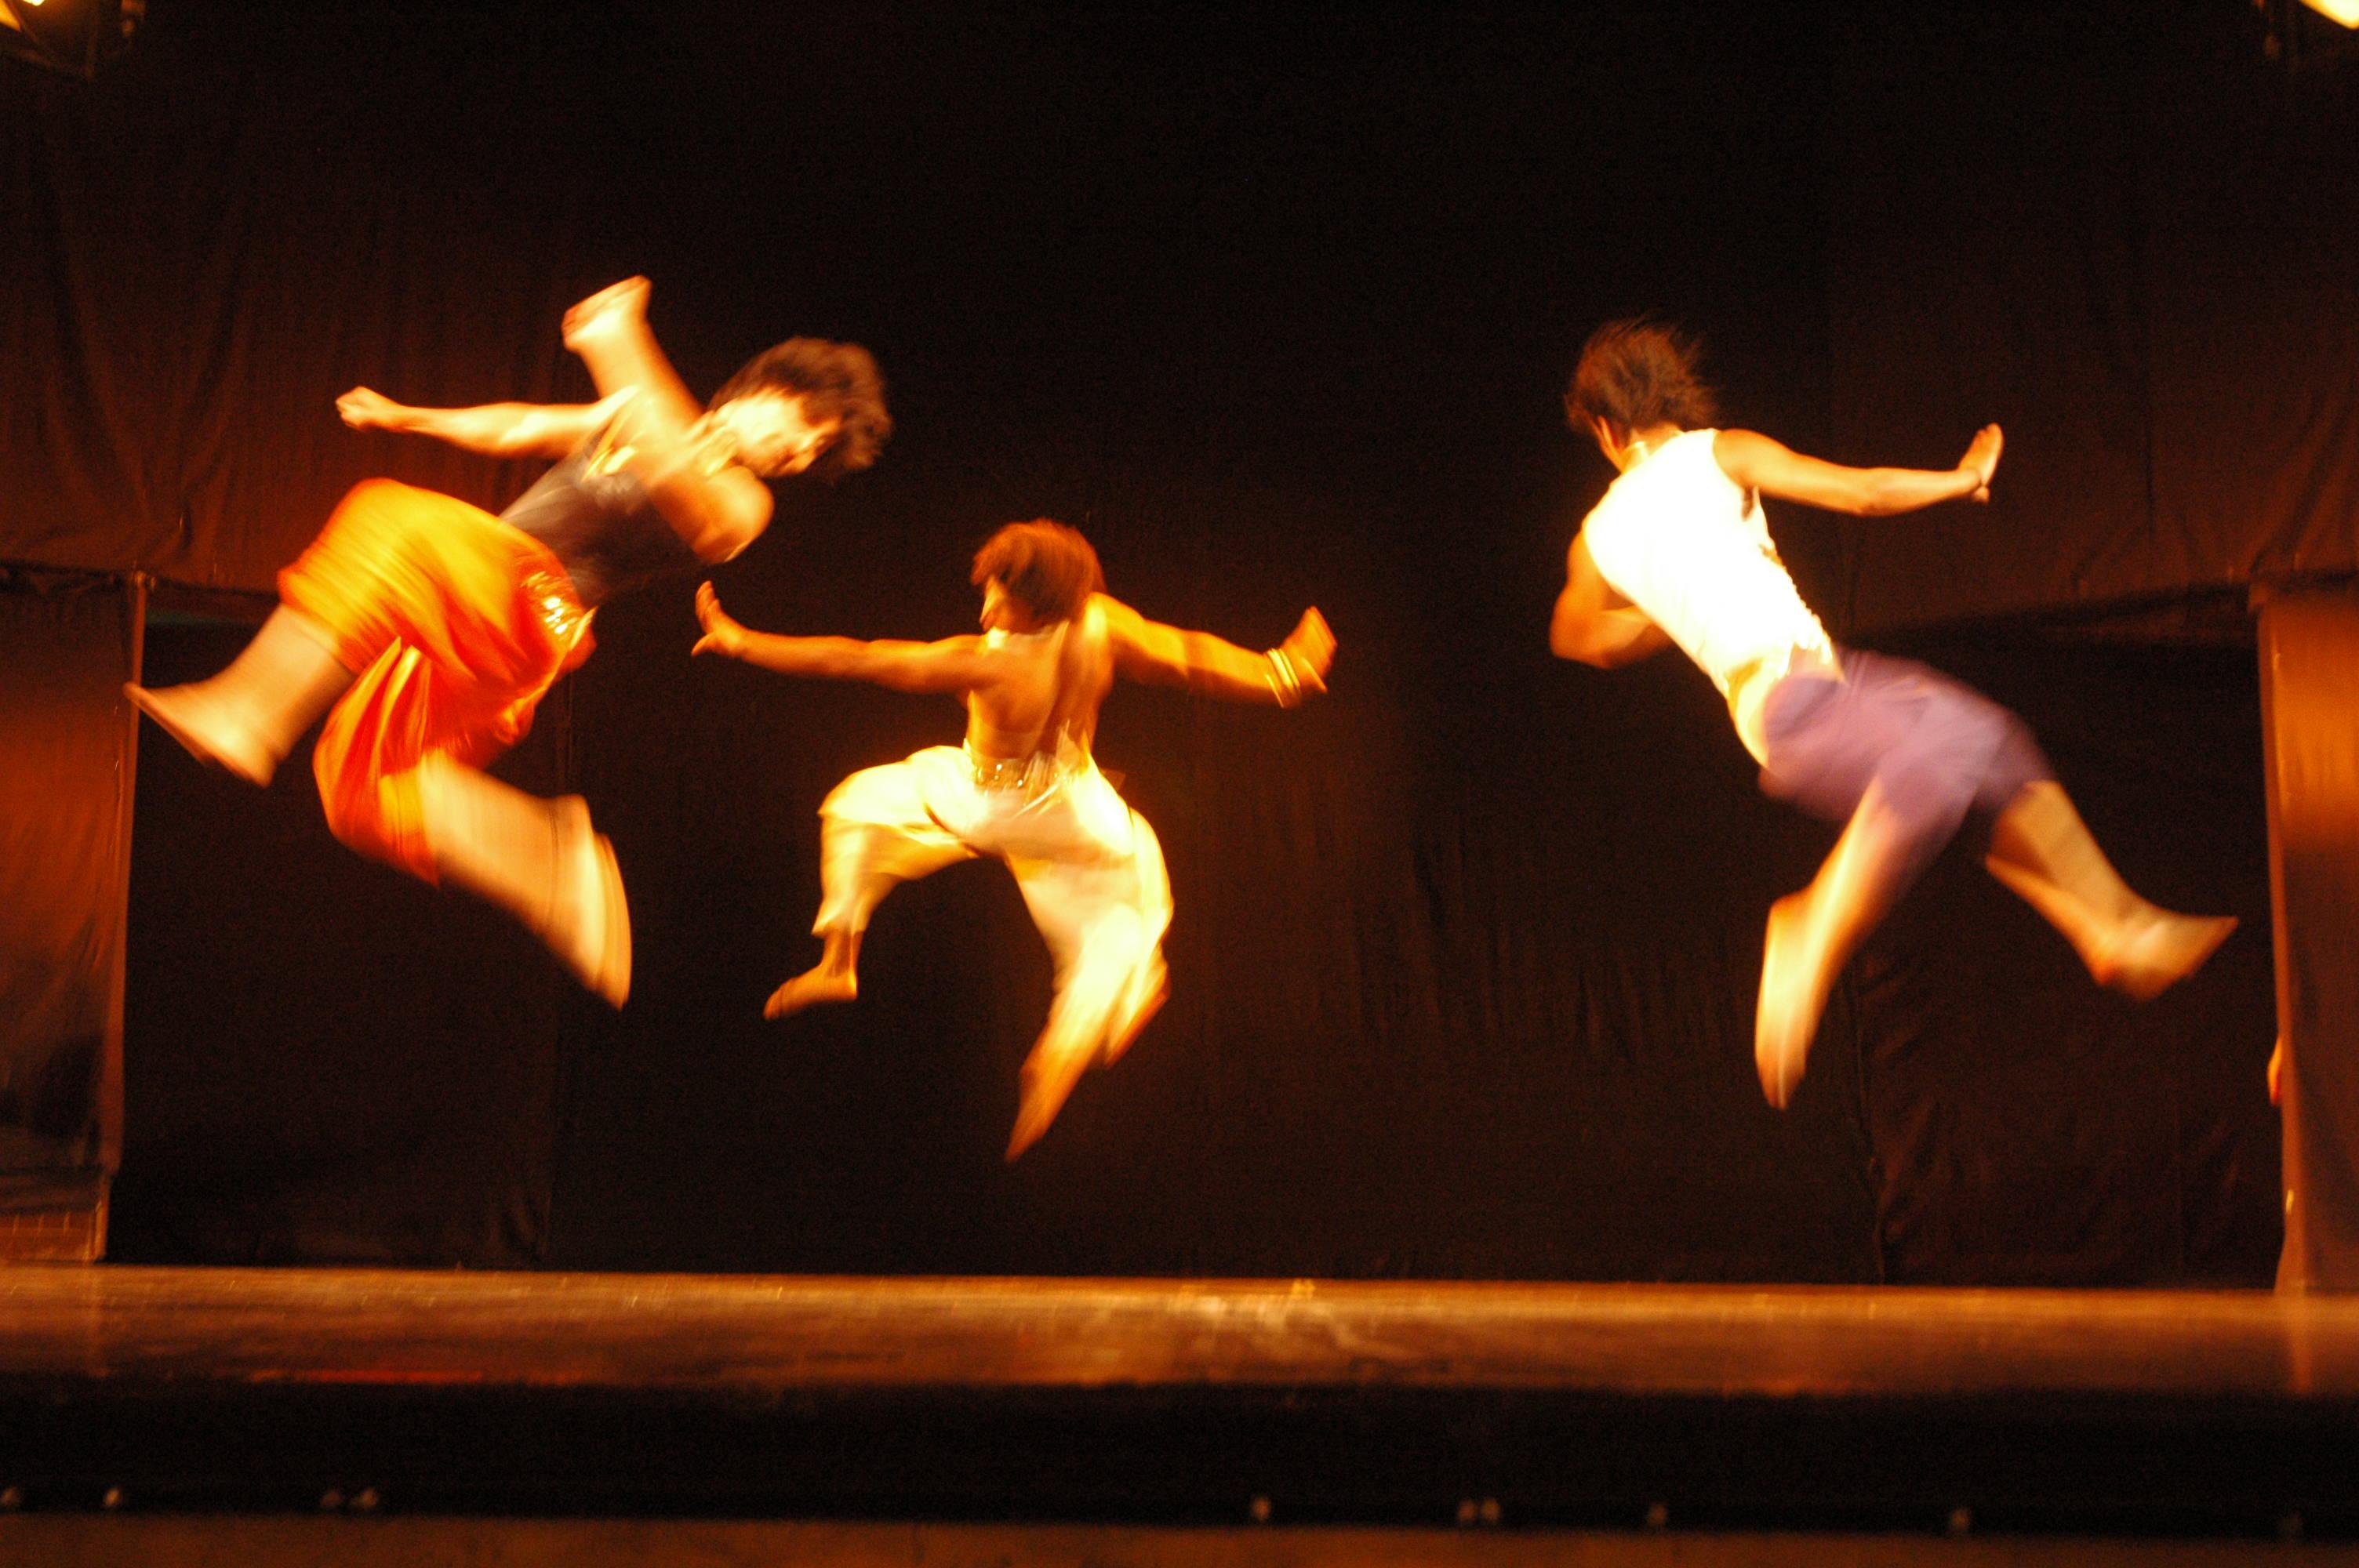 Chau, dance form with marshal art movements, Mayurbanj, India